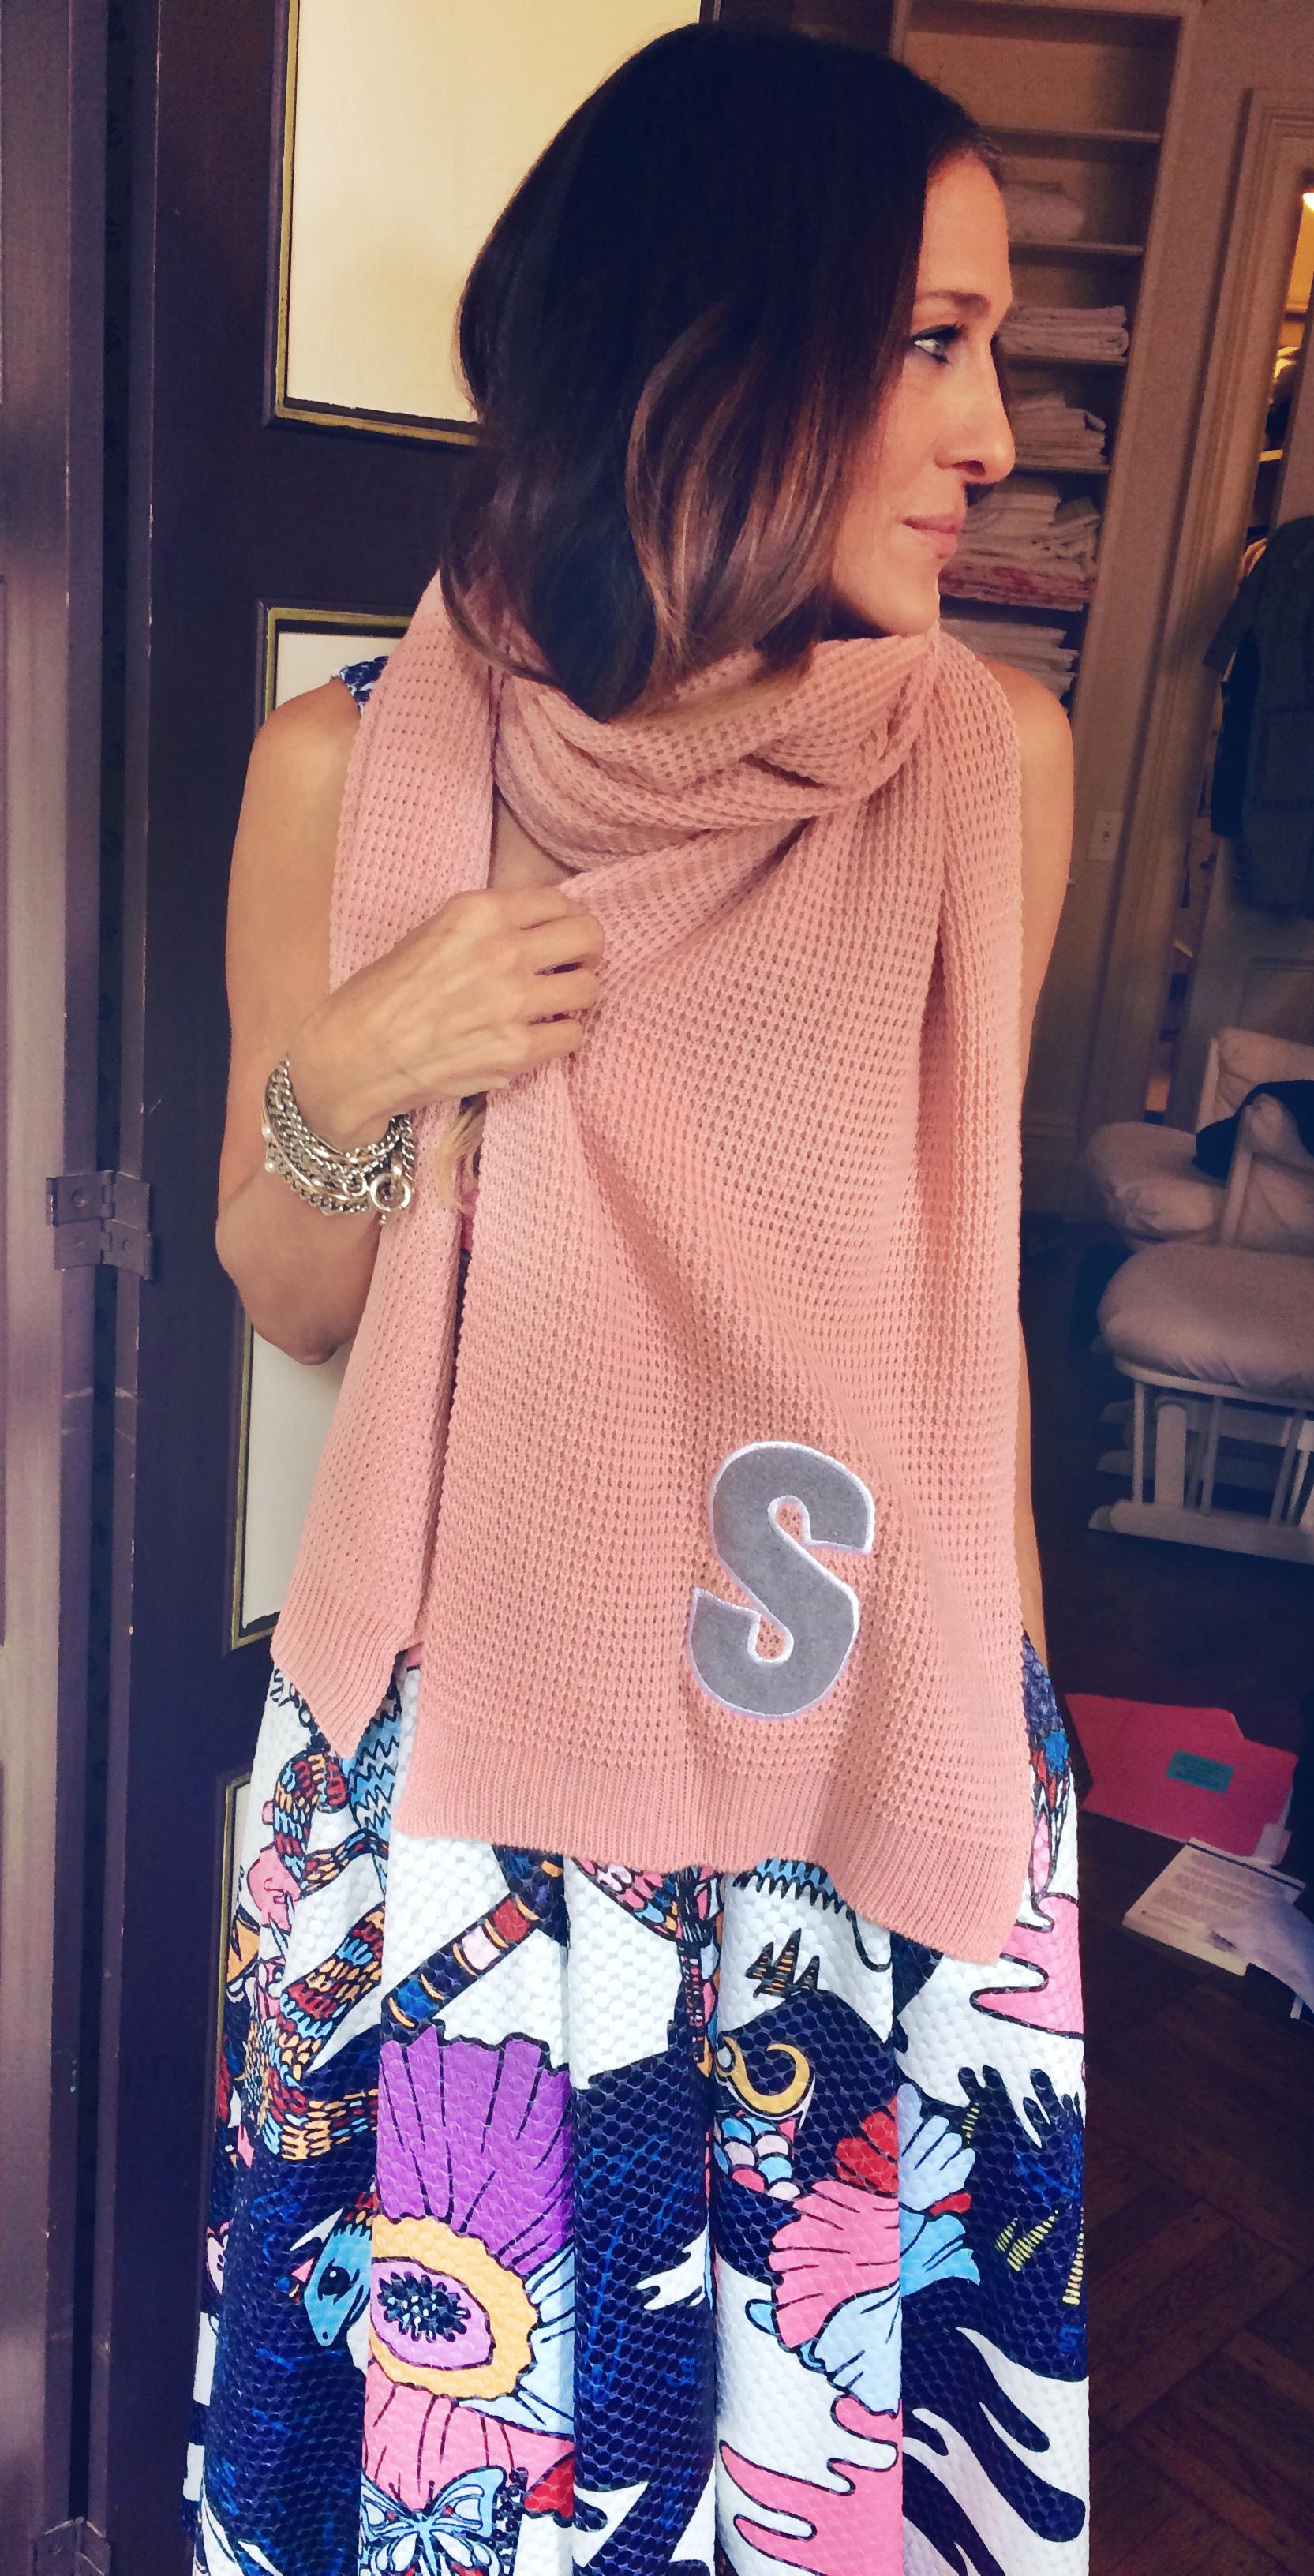 Matalan alphabet scarf, Matalan scarf, Scarf, Winter accessories, Cheap scarf, Charity gift, Alder Hay Children's hospital, Sarah Jessica Parker, SJP